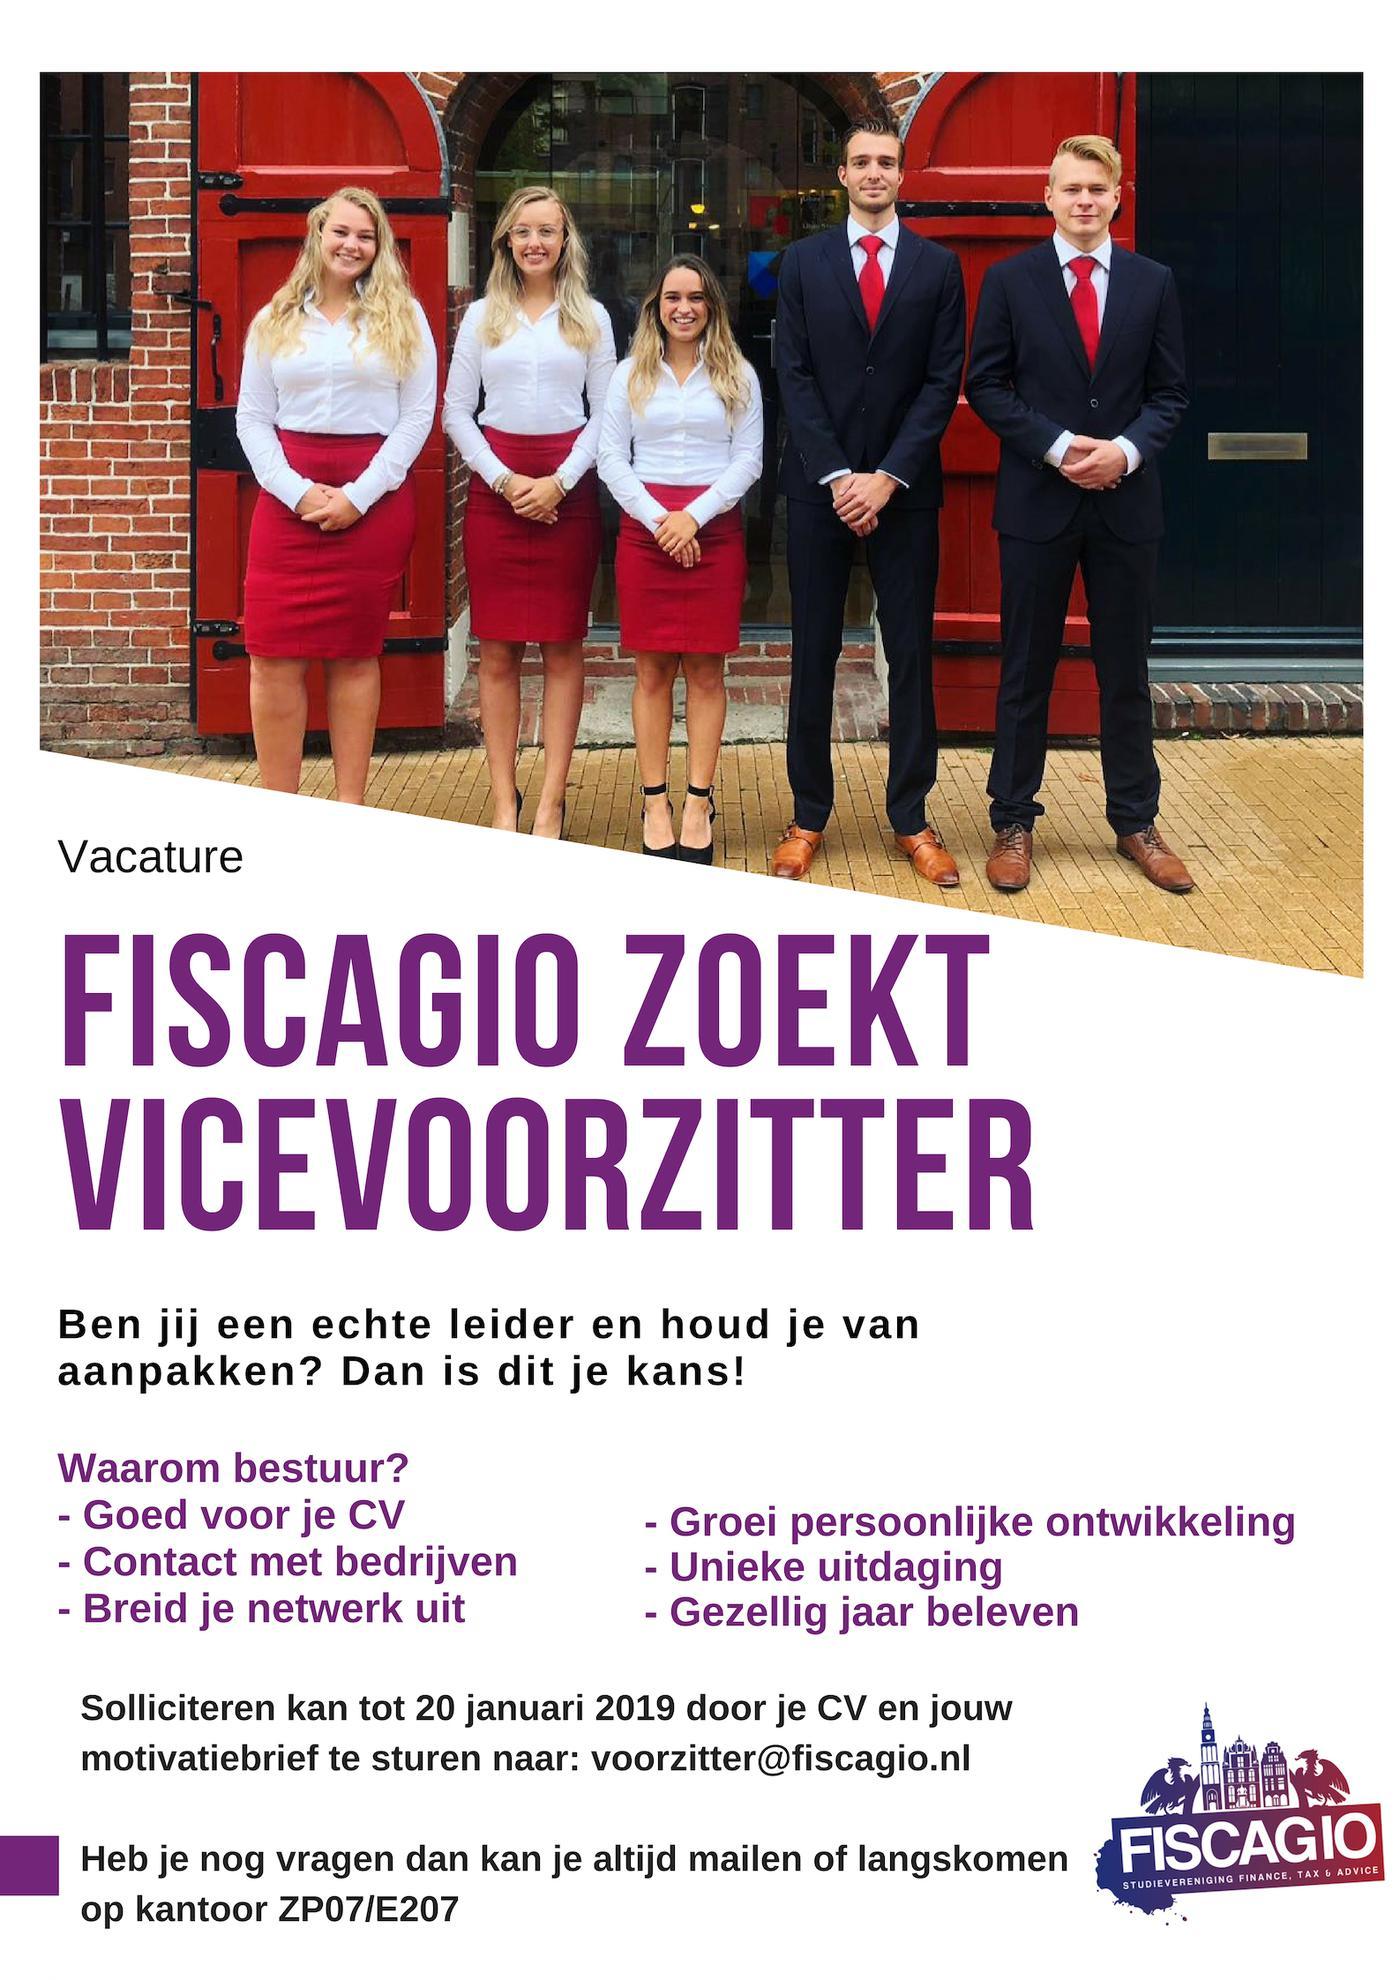 Fiscagio zoekt Vicevoorzitter!